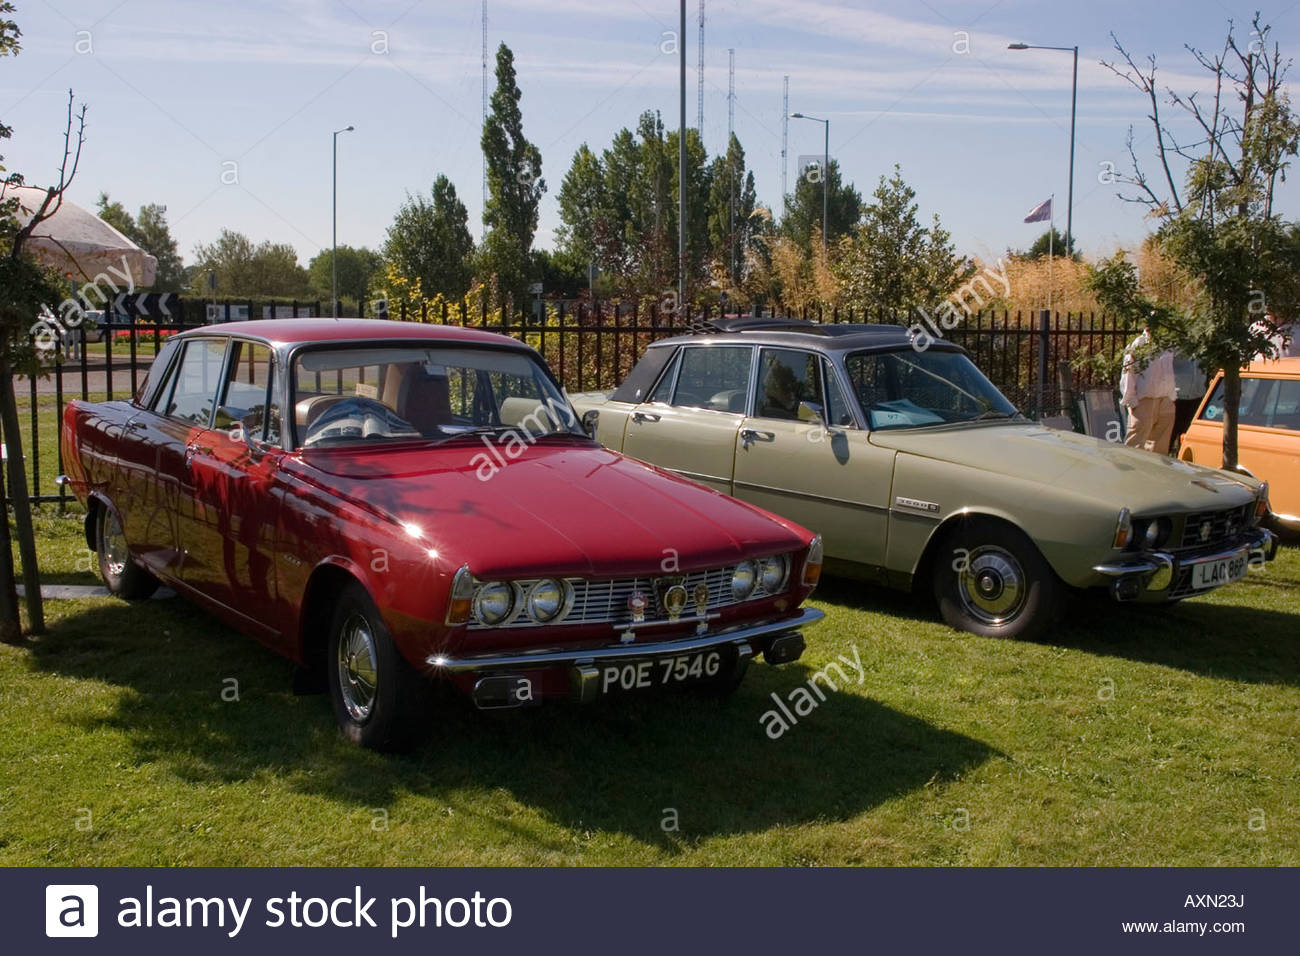 CLASSIC CARS BRITISH ROVER SEVENTIES V8 Stock Photo: 16881797 - Alamy